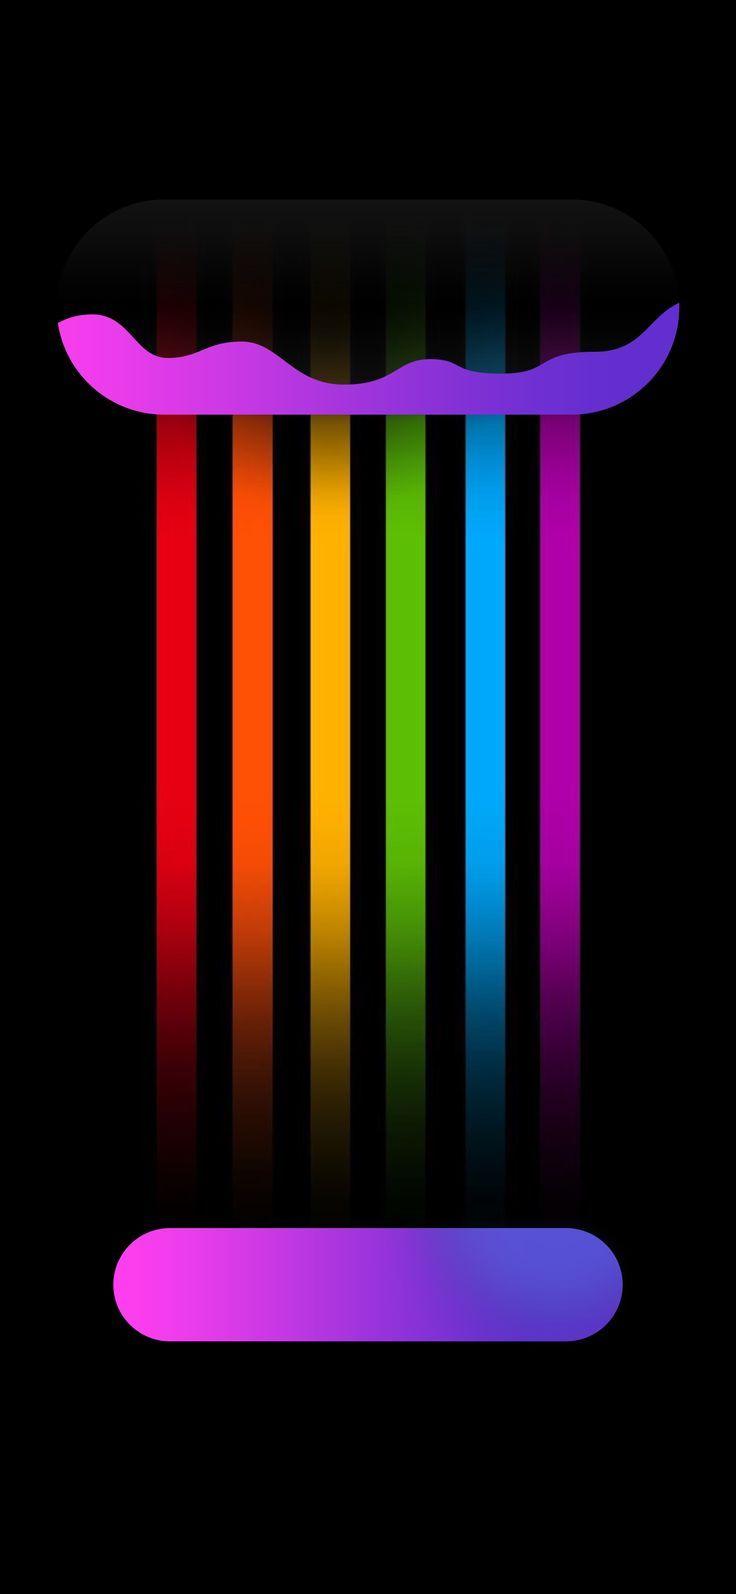 Iphone X Wallpaper Wallpaper Iphone X 364862007307030158 Iphone